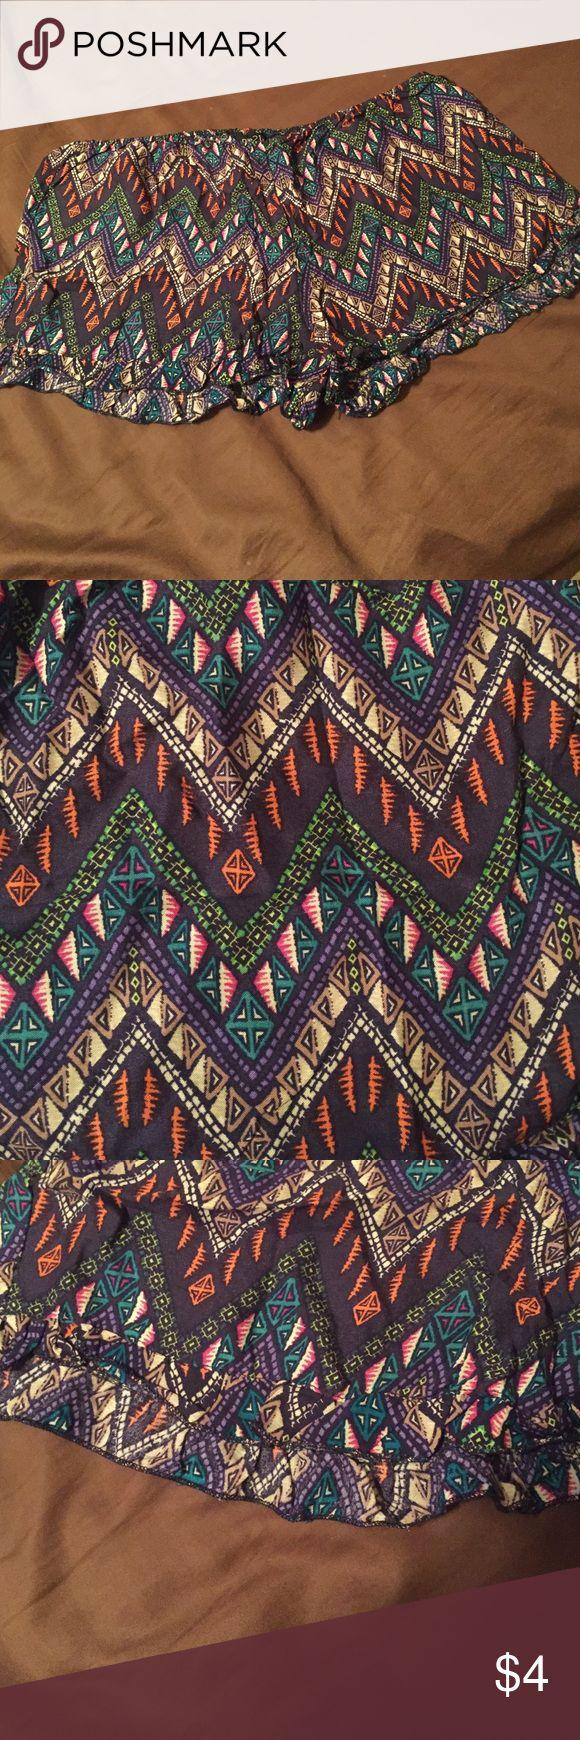 Rue 21 Aztec print shorts Very light weight material. Never worn. Size XL. Excellent condition. Rue 21 Shorts Bermudas